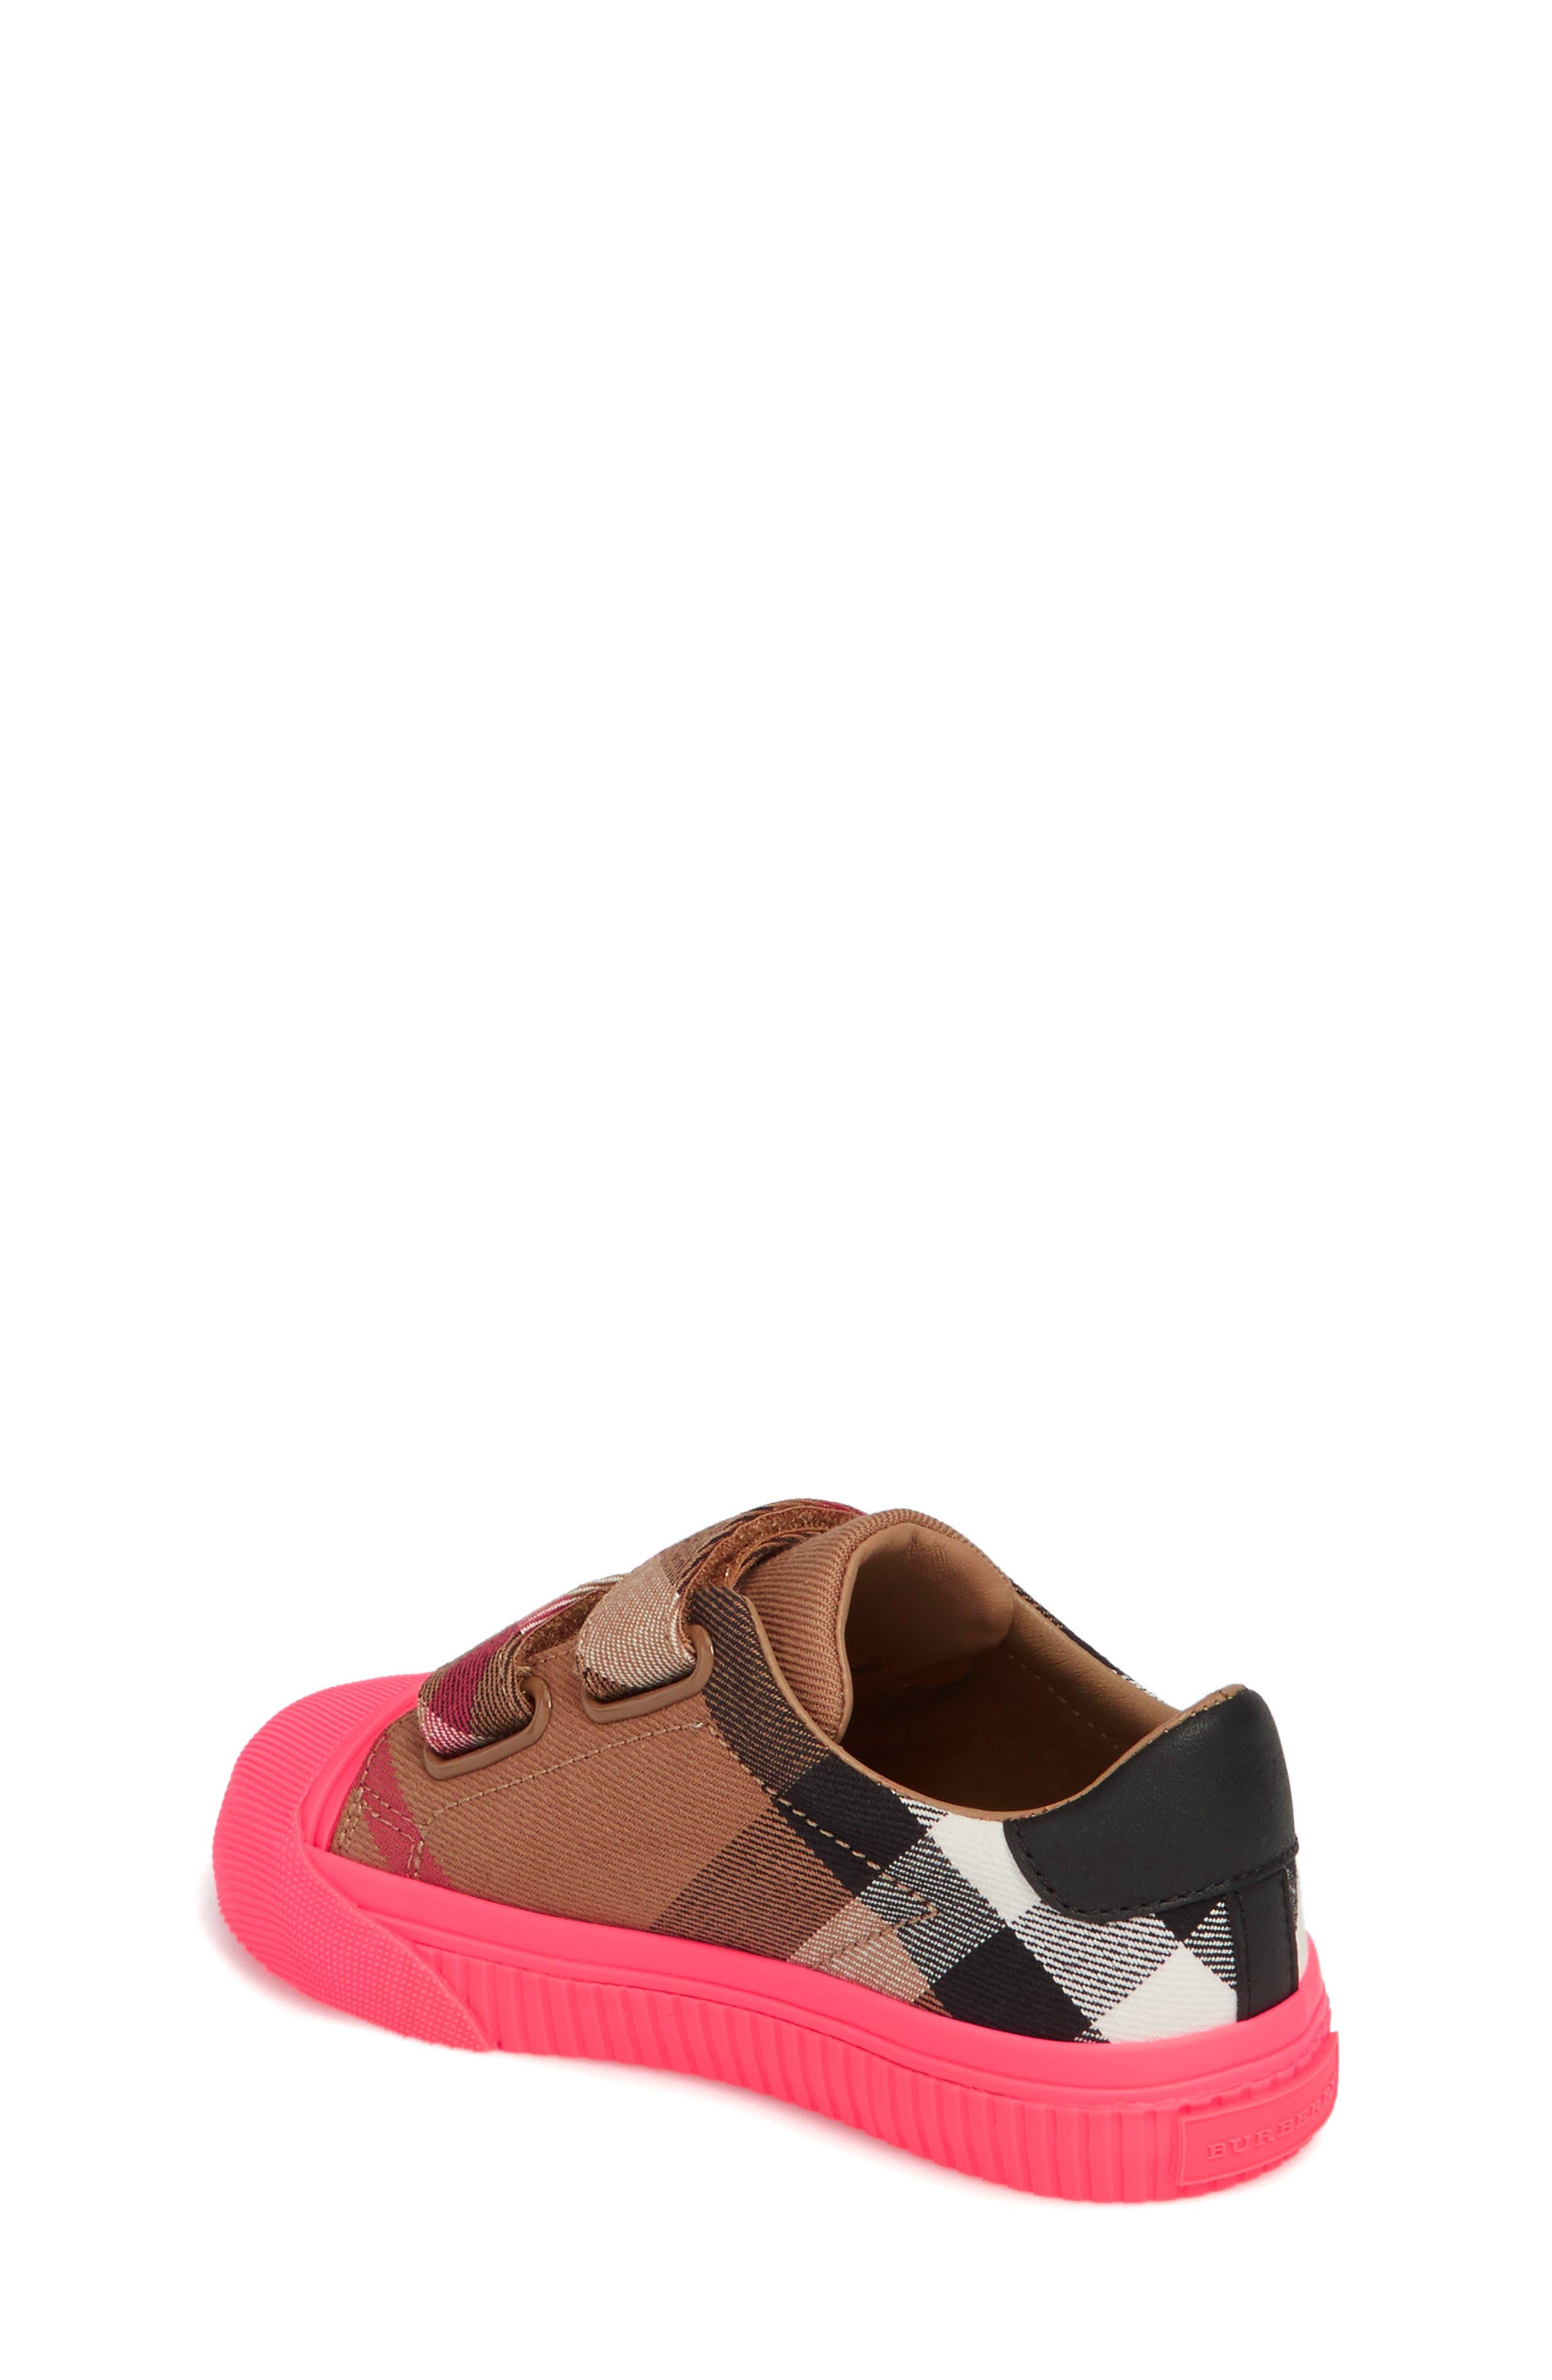 Belside Sneaker,                             Alternate thumbnail 2, color,                             Classic/ Neon Pink